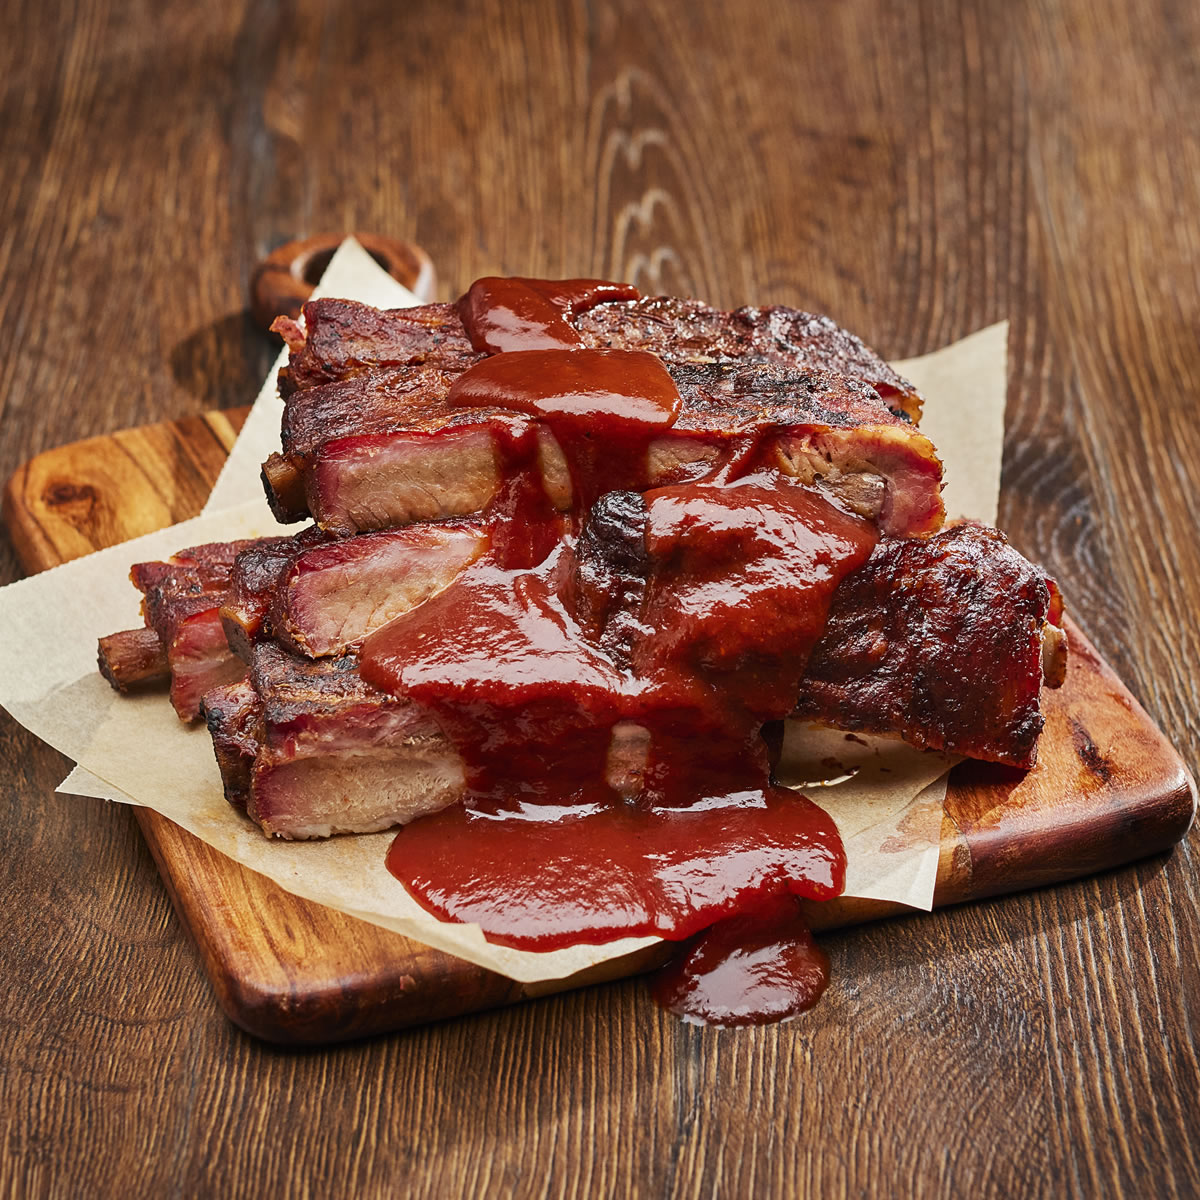 Half Slab of Pork Ribs (Sauced)